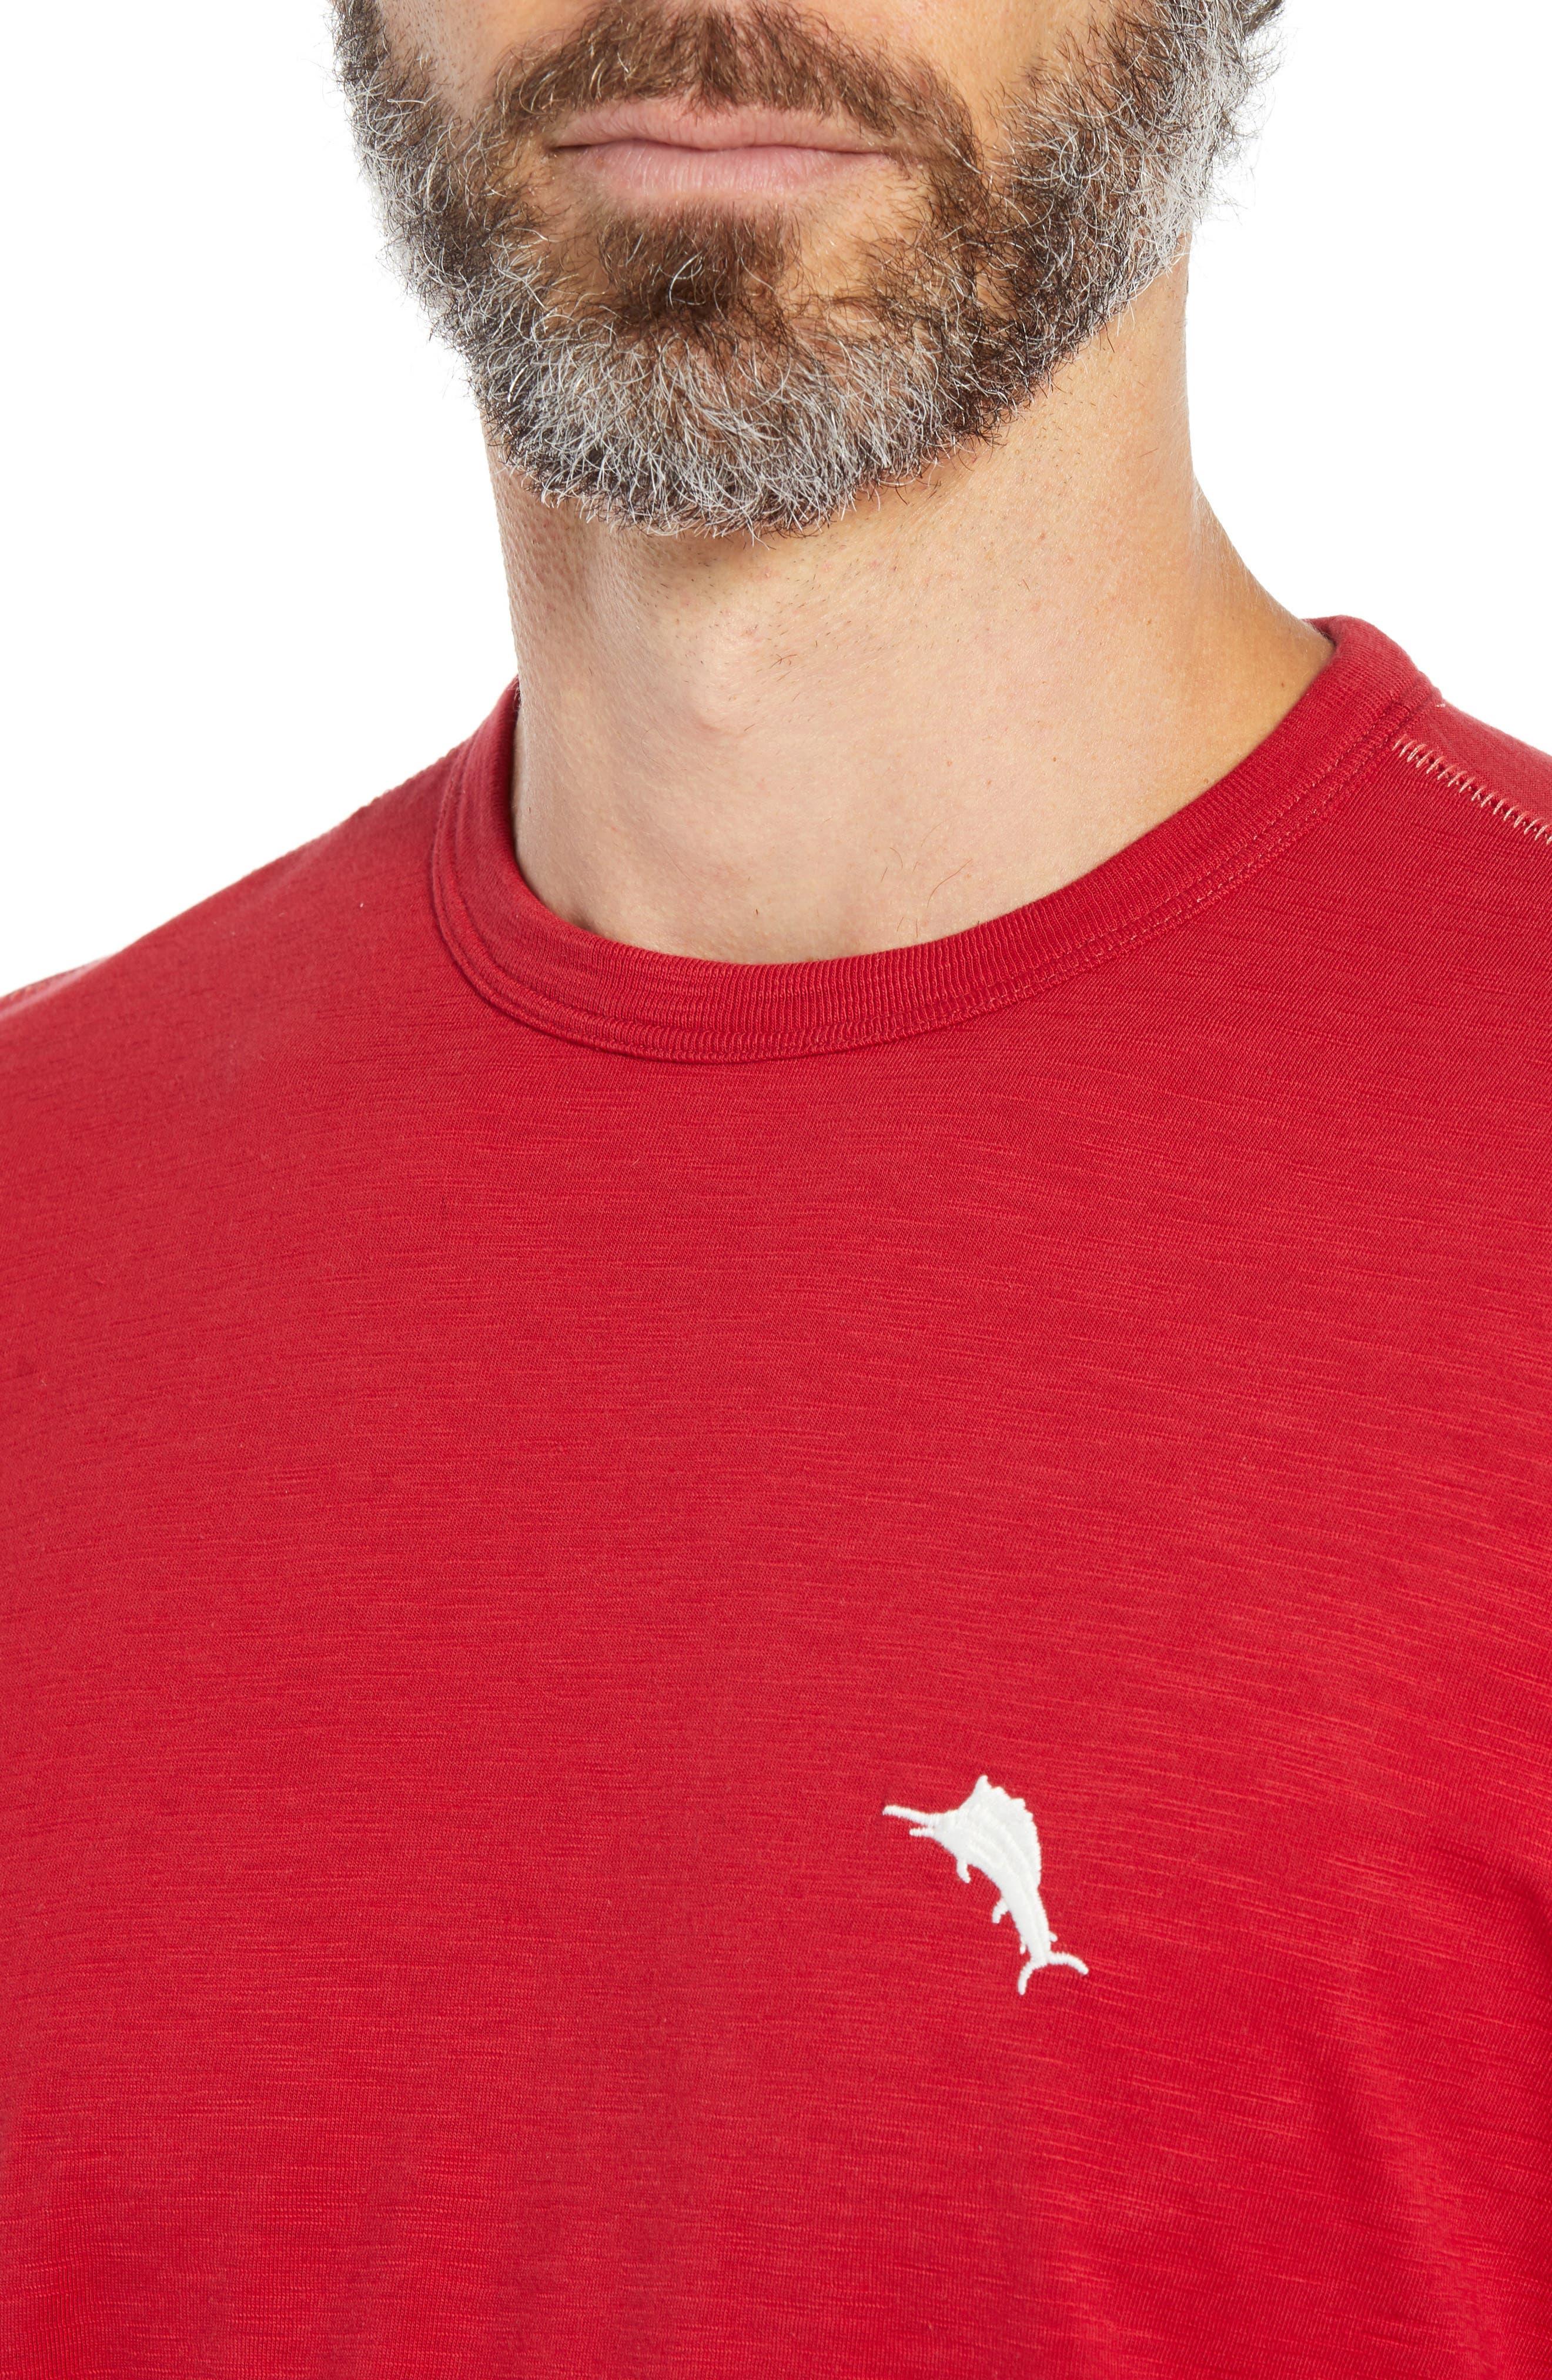 Mele Kalikimaka T-Shirt,                             Alternate thumbnail 4, color,                             SCOOTER RED